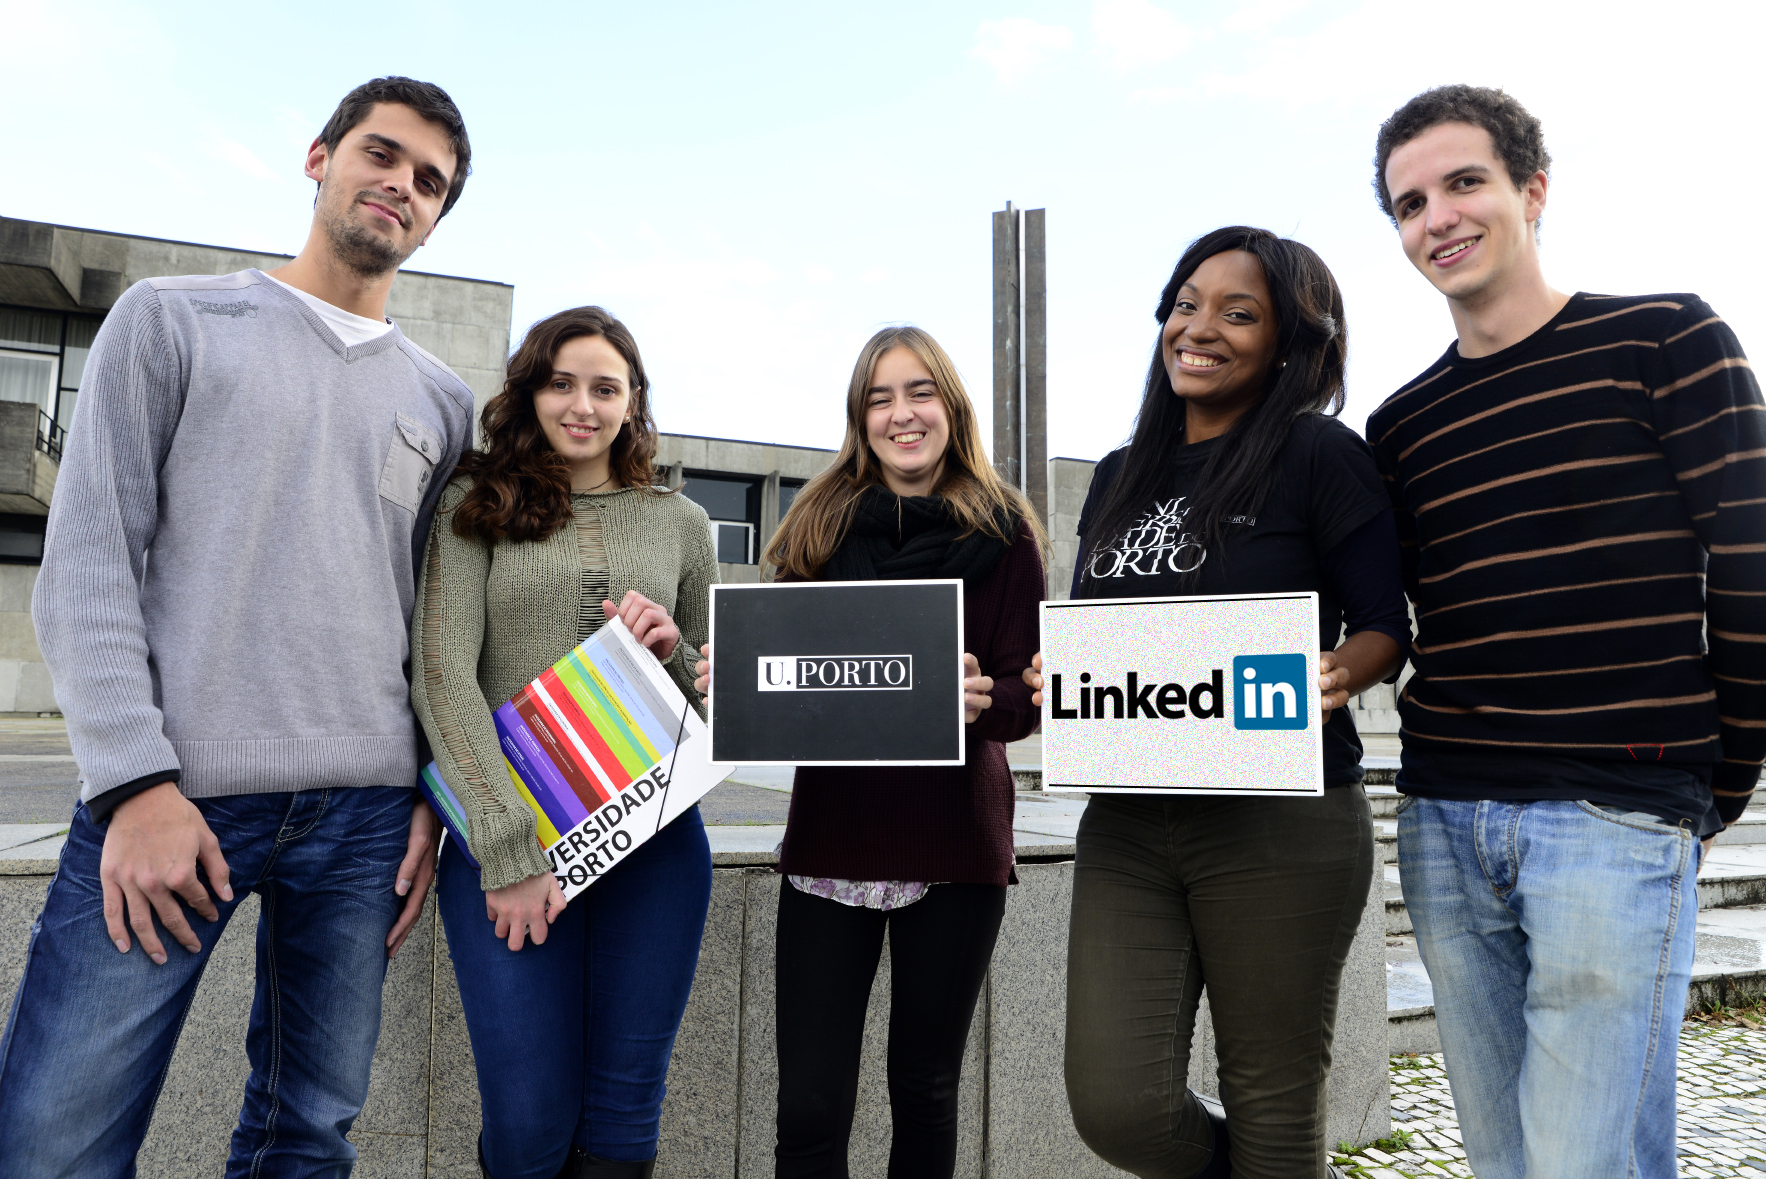 Linkedin UPorto alumni antigos estudantes universidade do porto